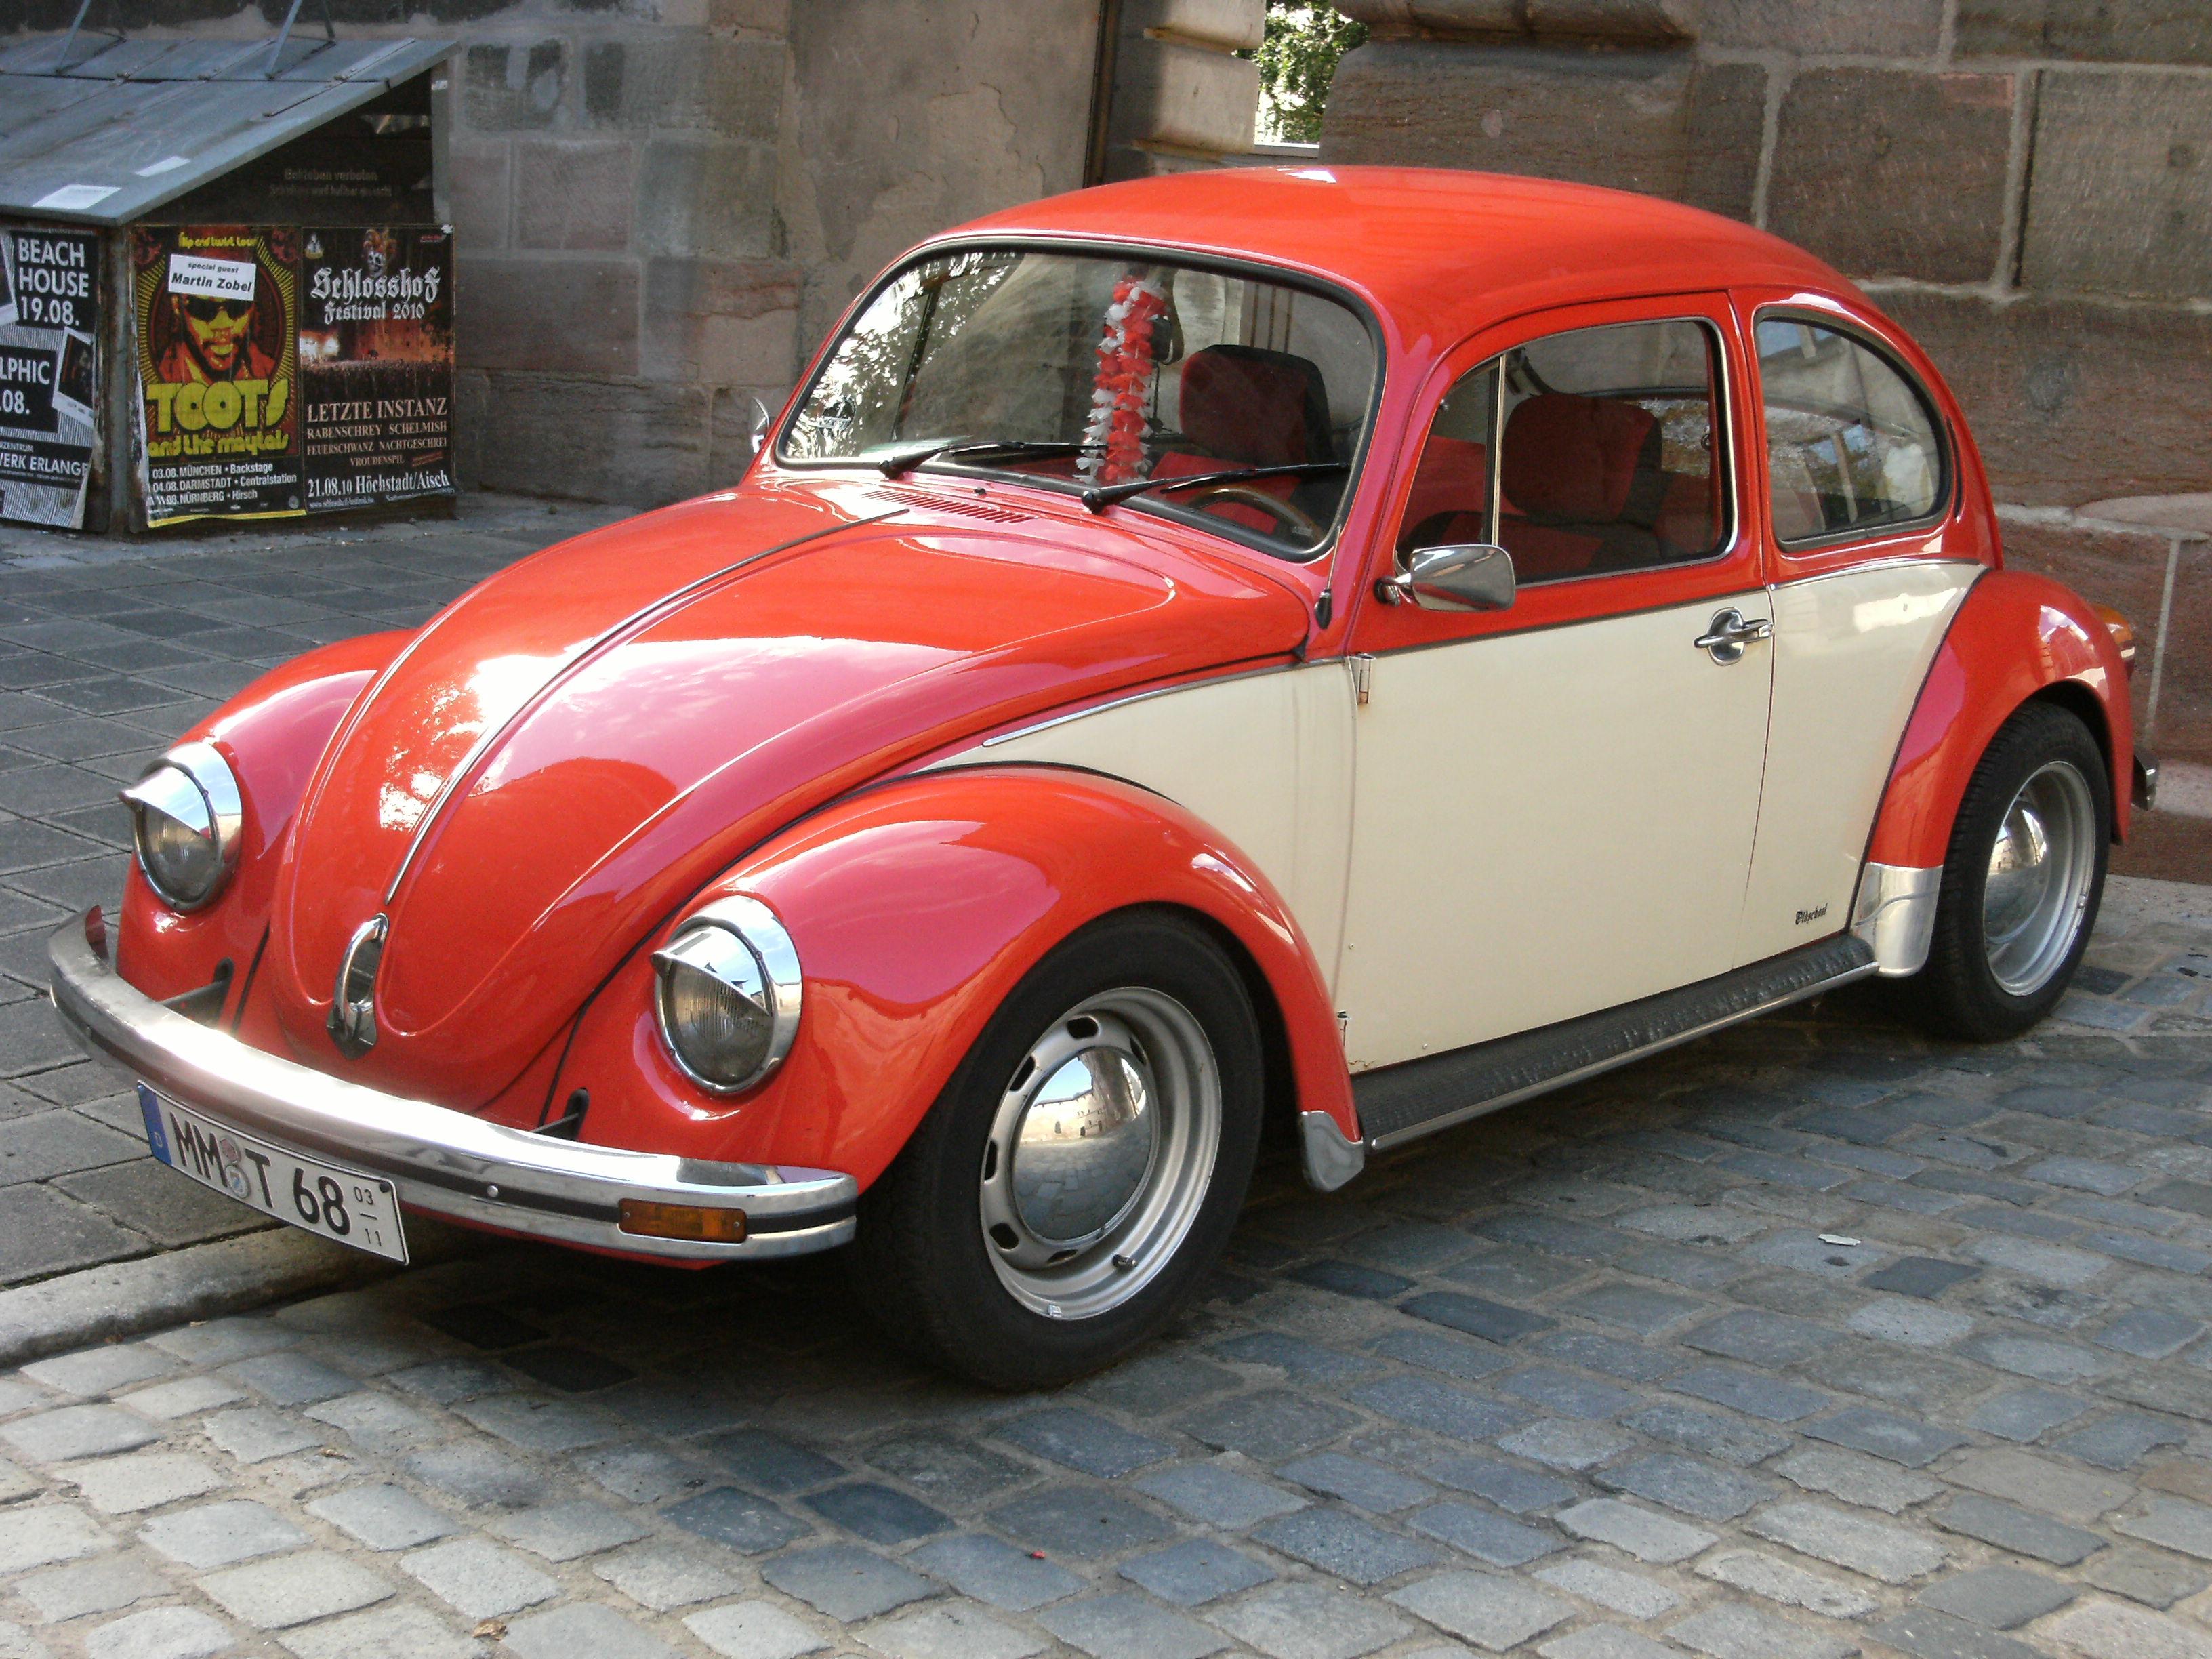 File:Volkswagen beetle in Nürnberg.JPG - Wikimedia Commons